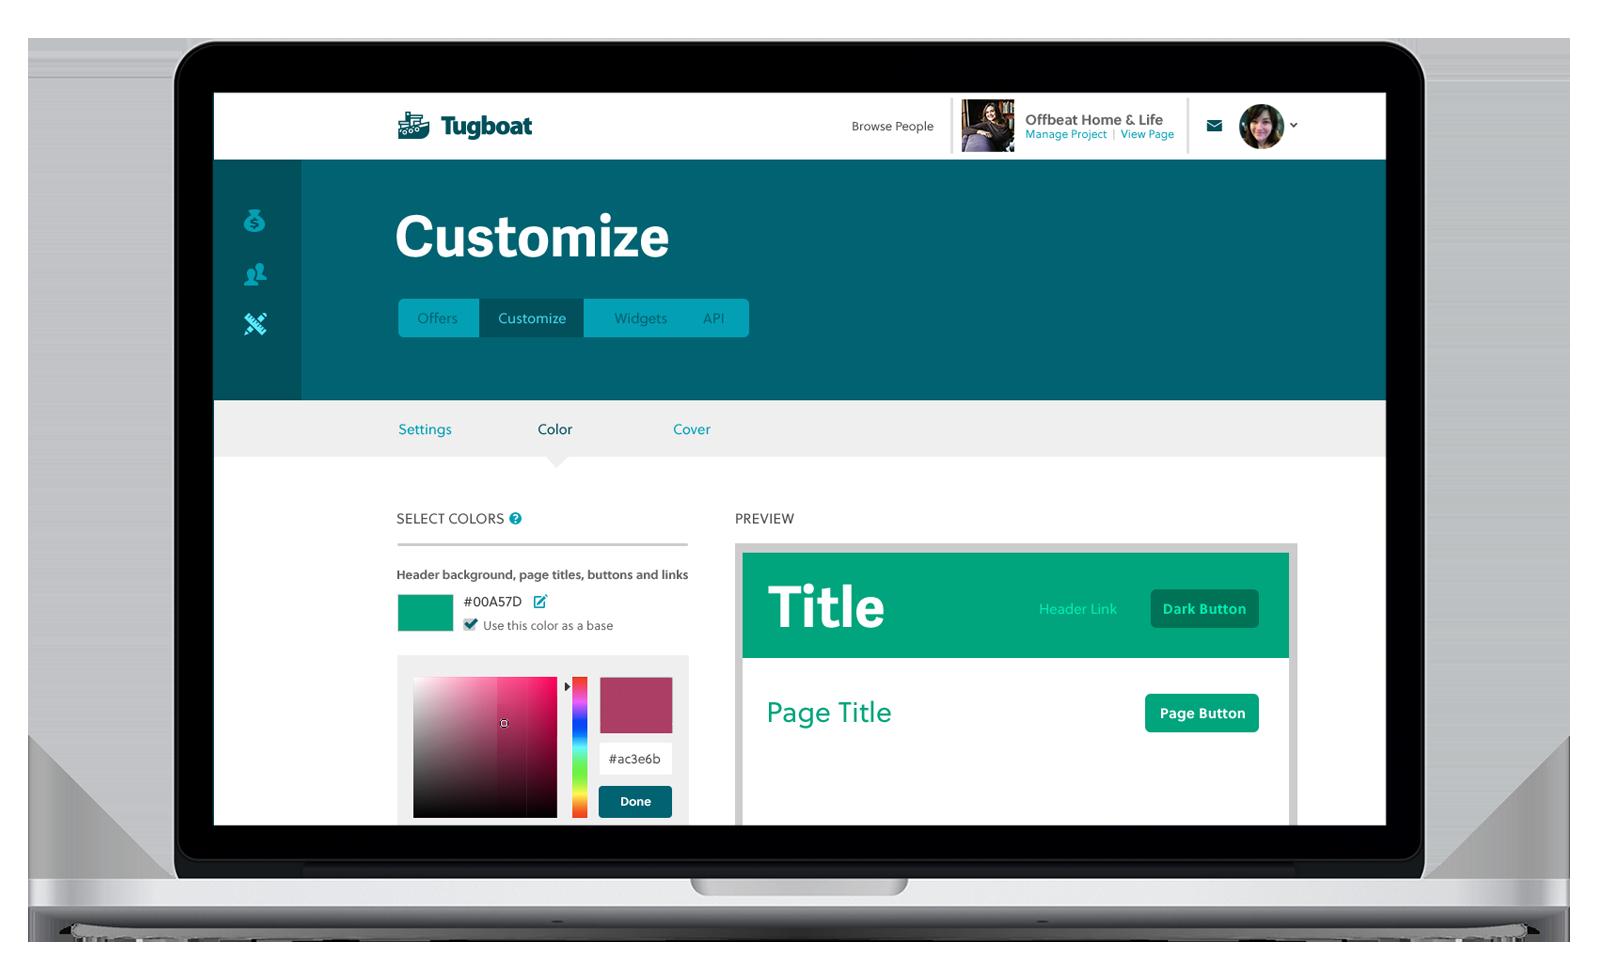 tugboat_customize_colors